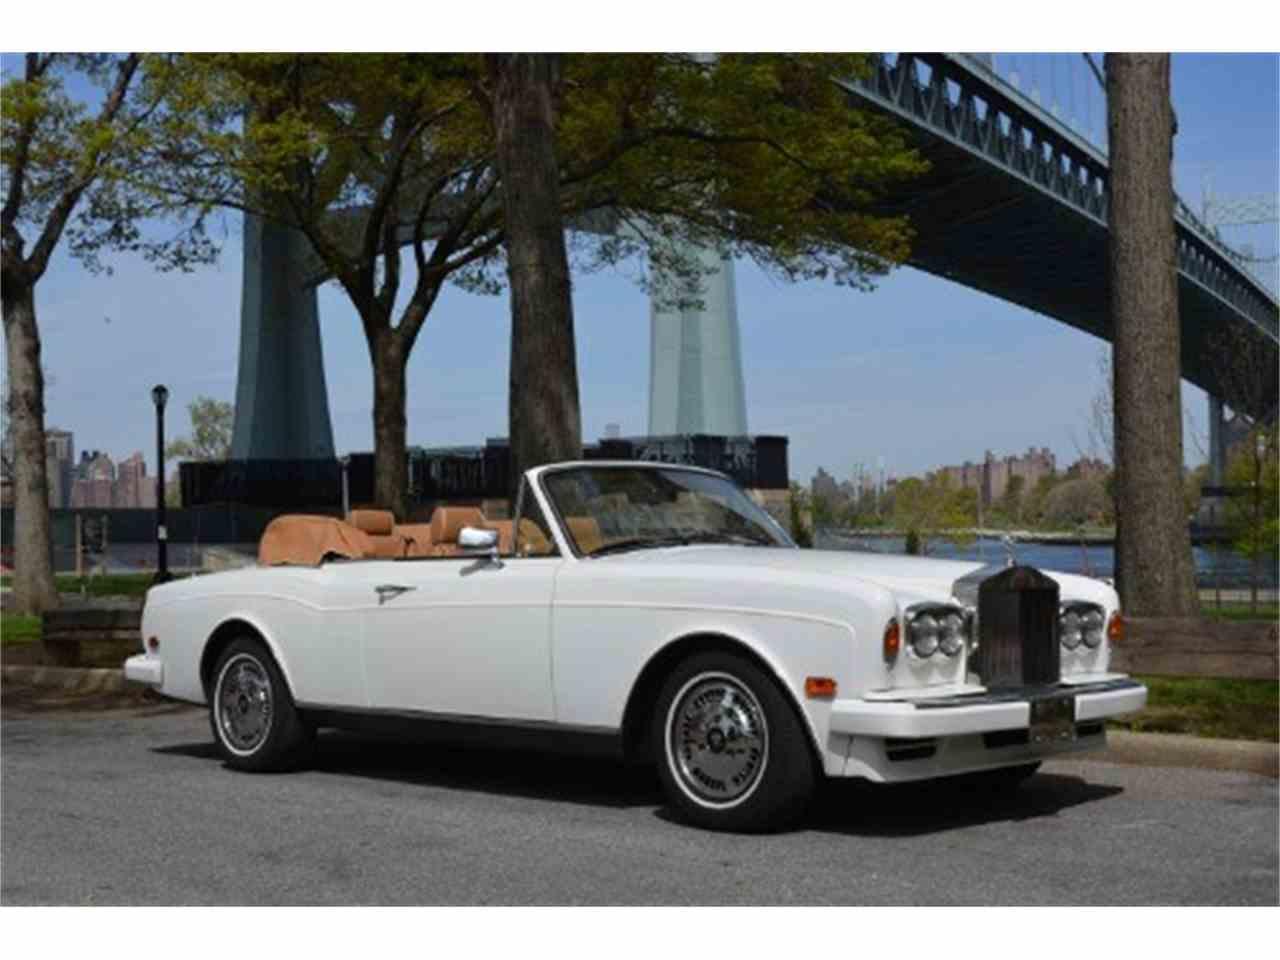 New York Car Auctions Public